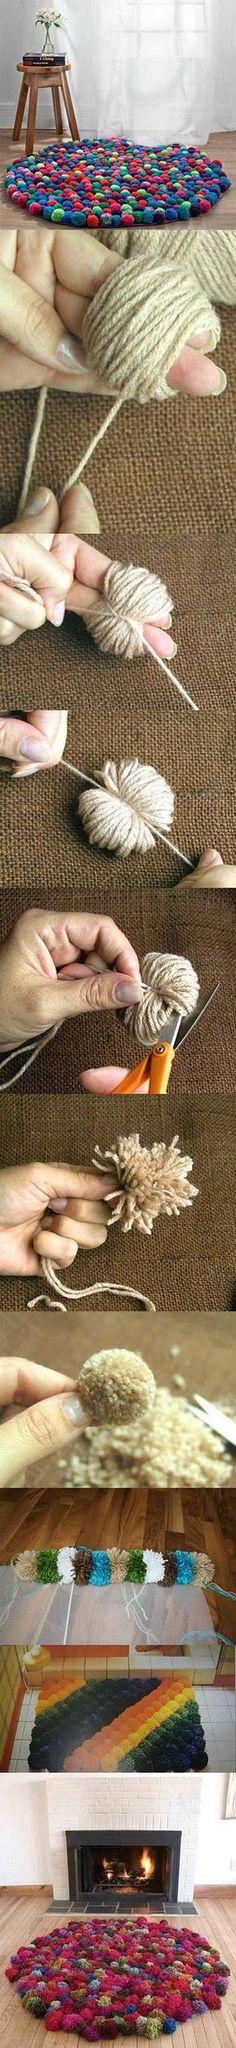 Diy Beautiful Carpet   DIY & Crafts Tutorials